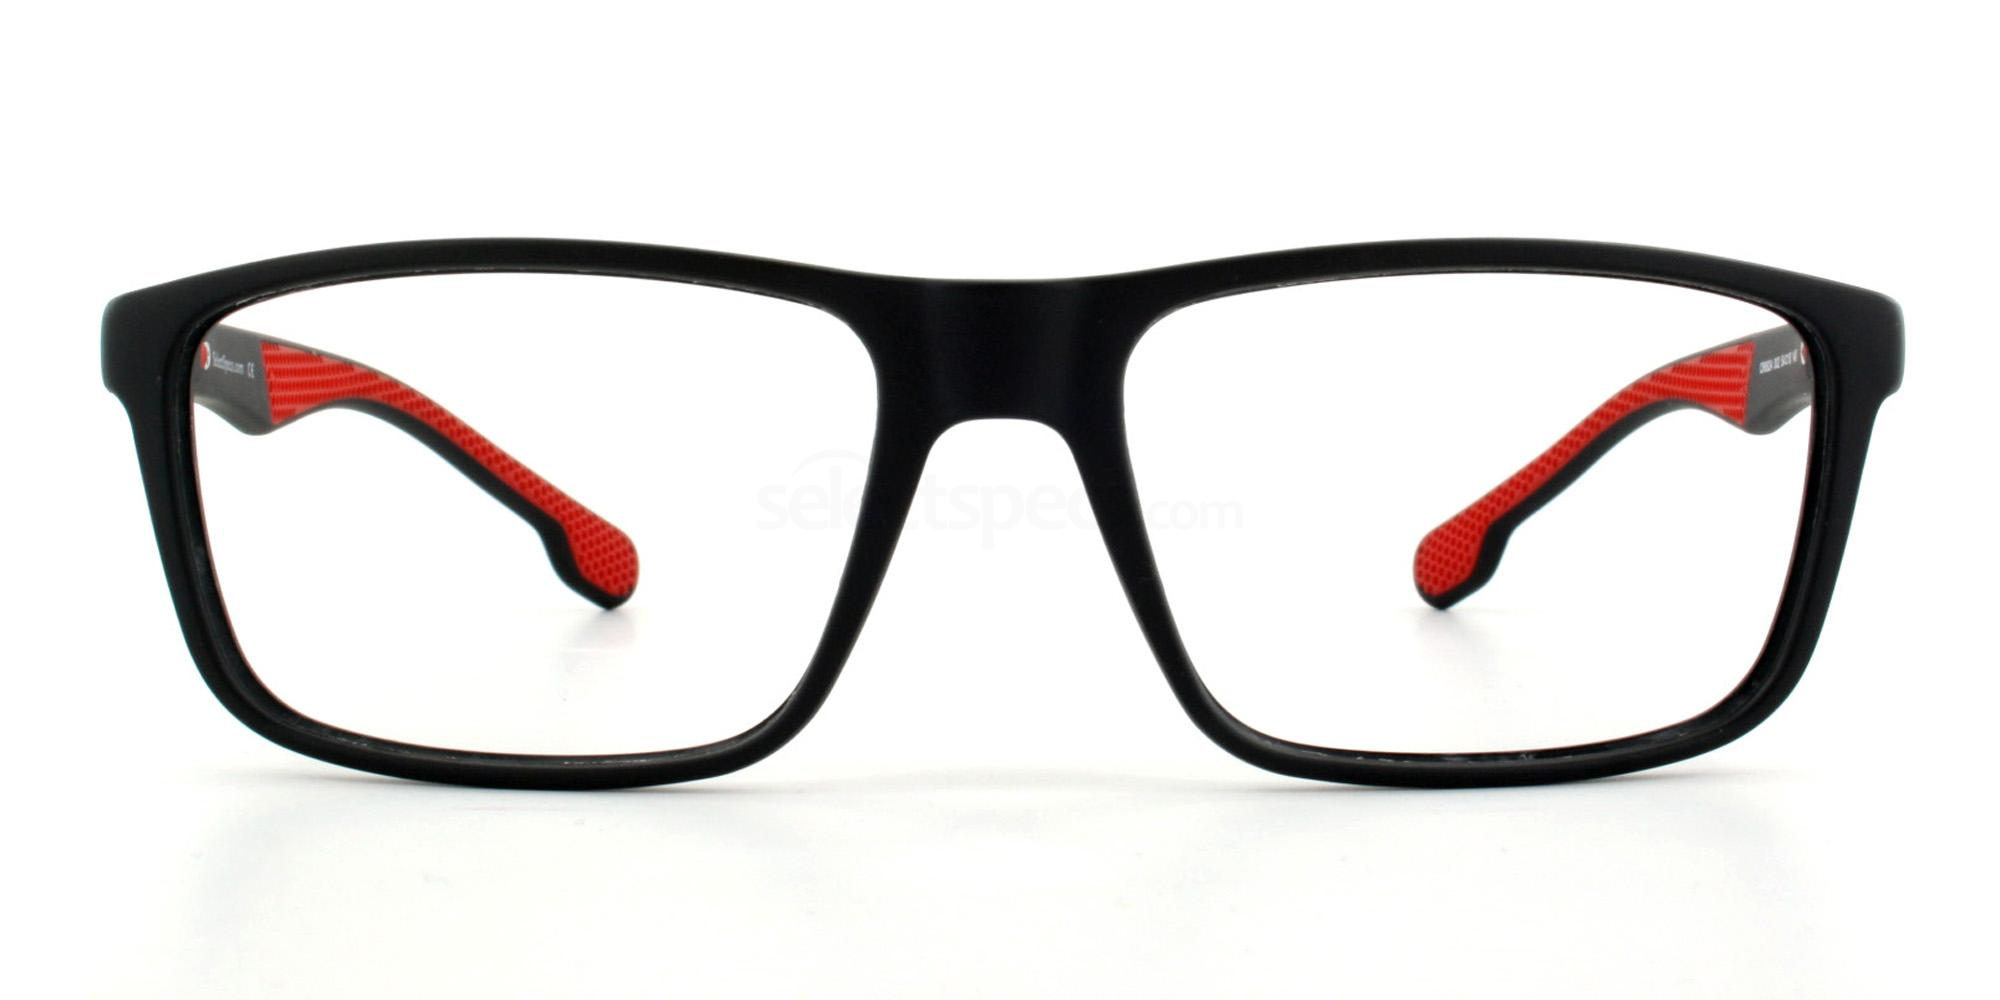 002 CR8824 Glasses, Infinity